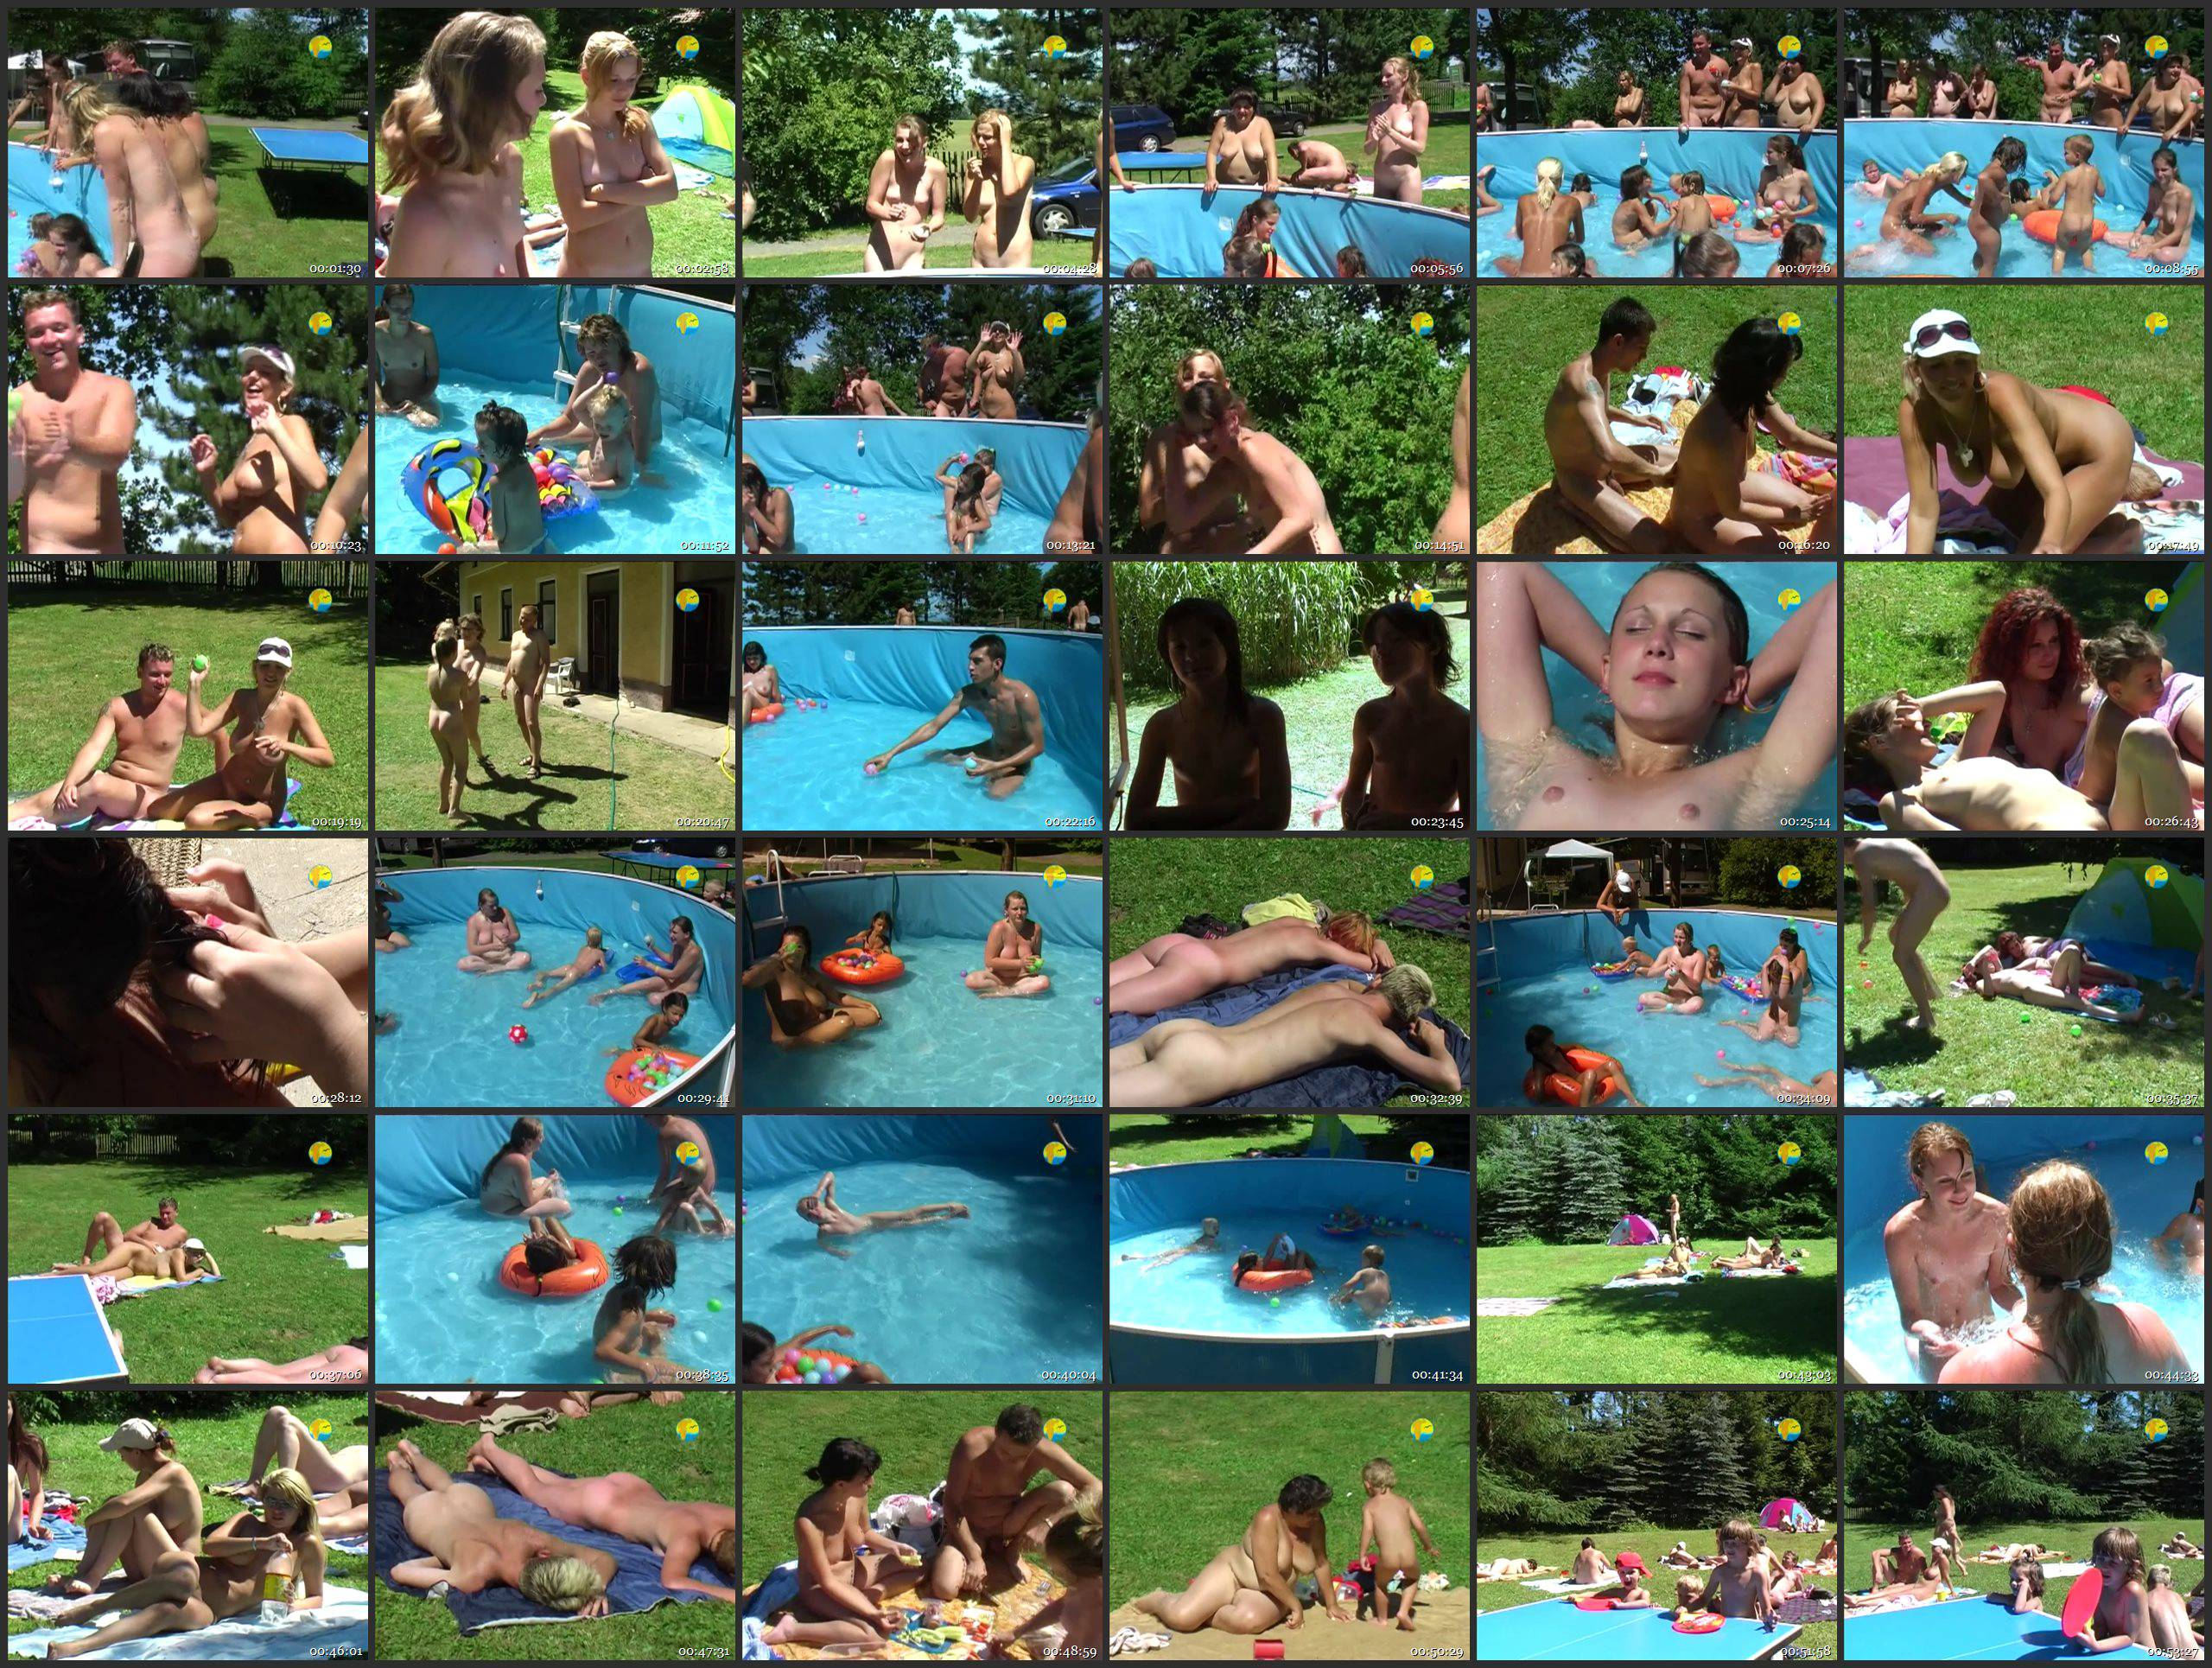 Naturist Freedom Videos Merry Pool - Thumbnails